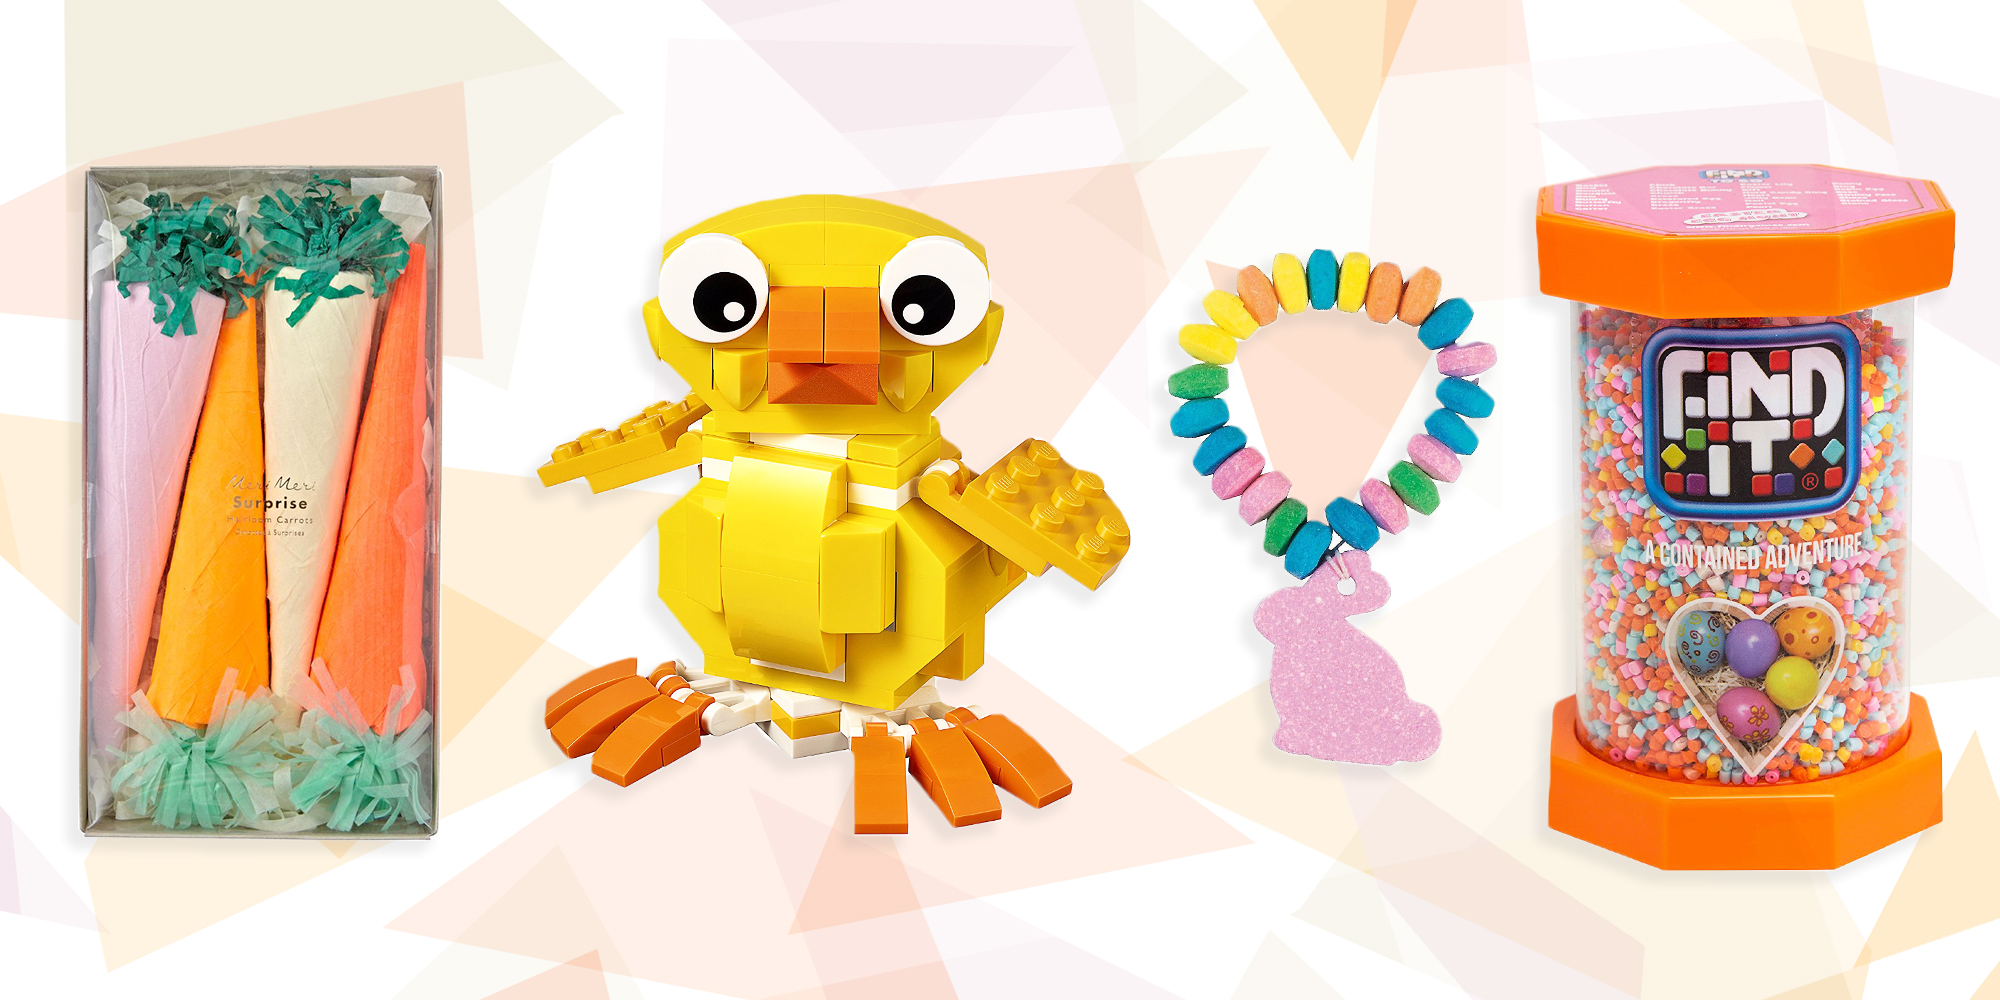 26 Best Easter Basket Ideas for Kids in 2018 - Cute Easter ...